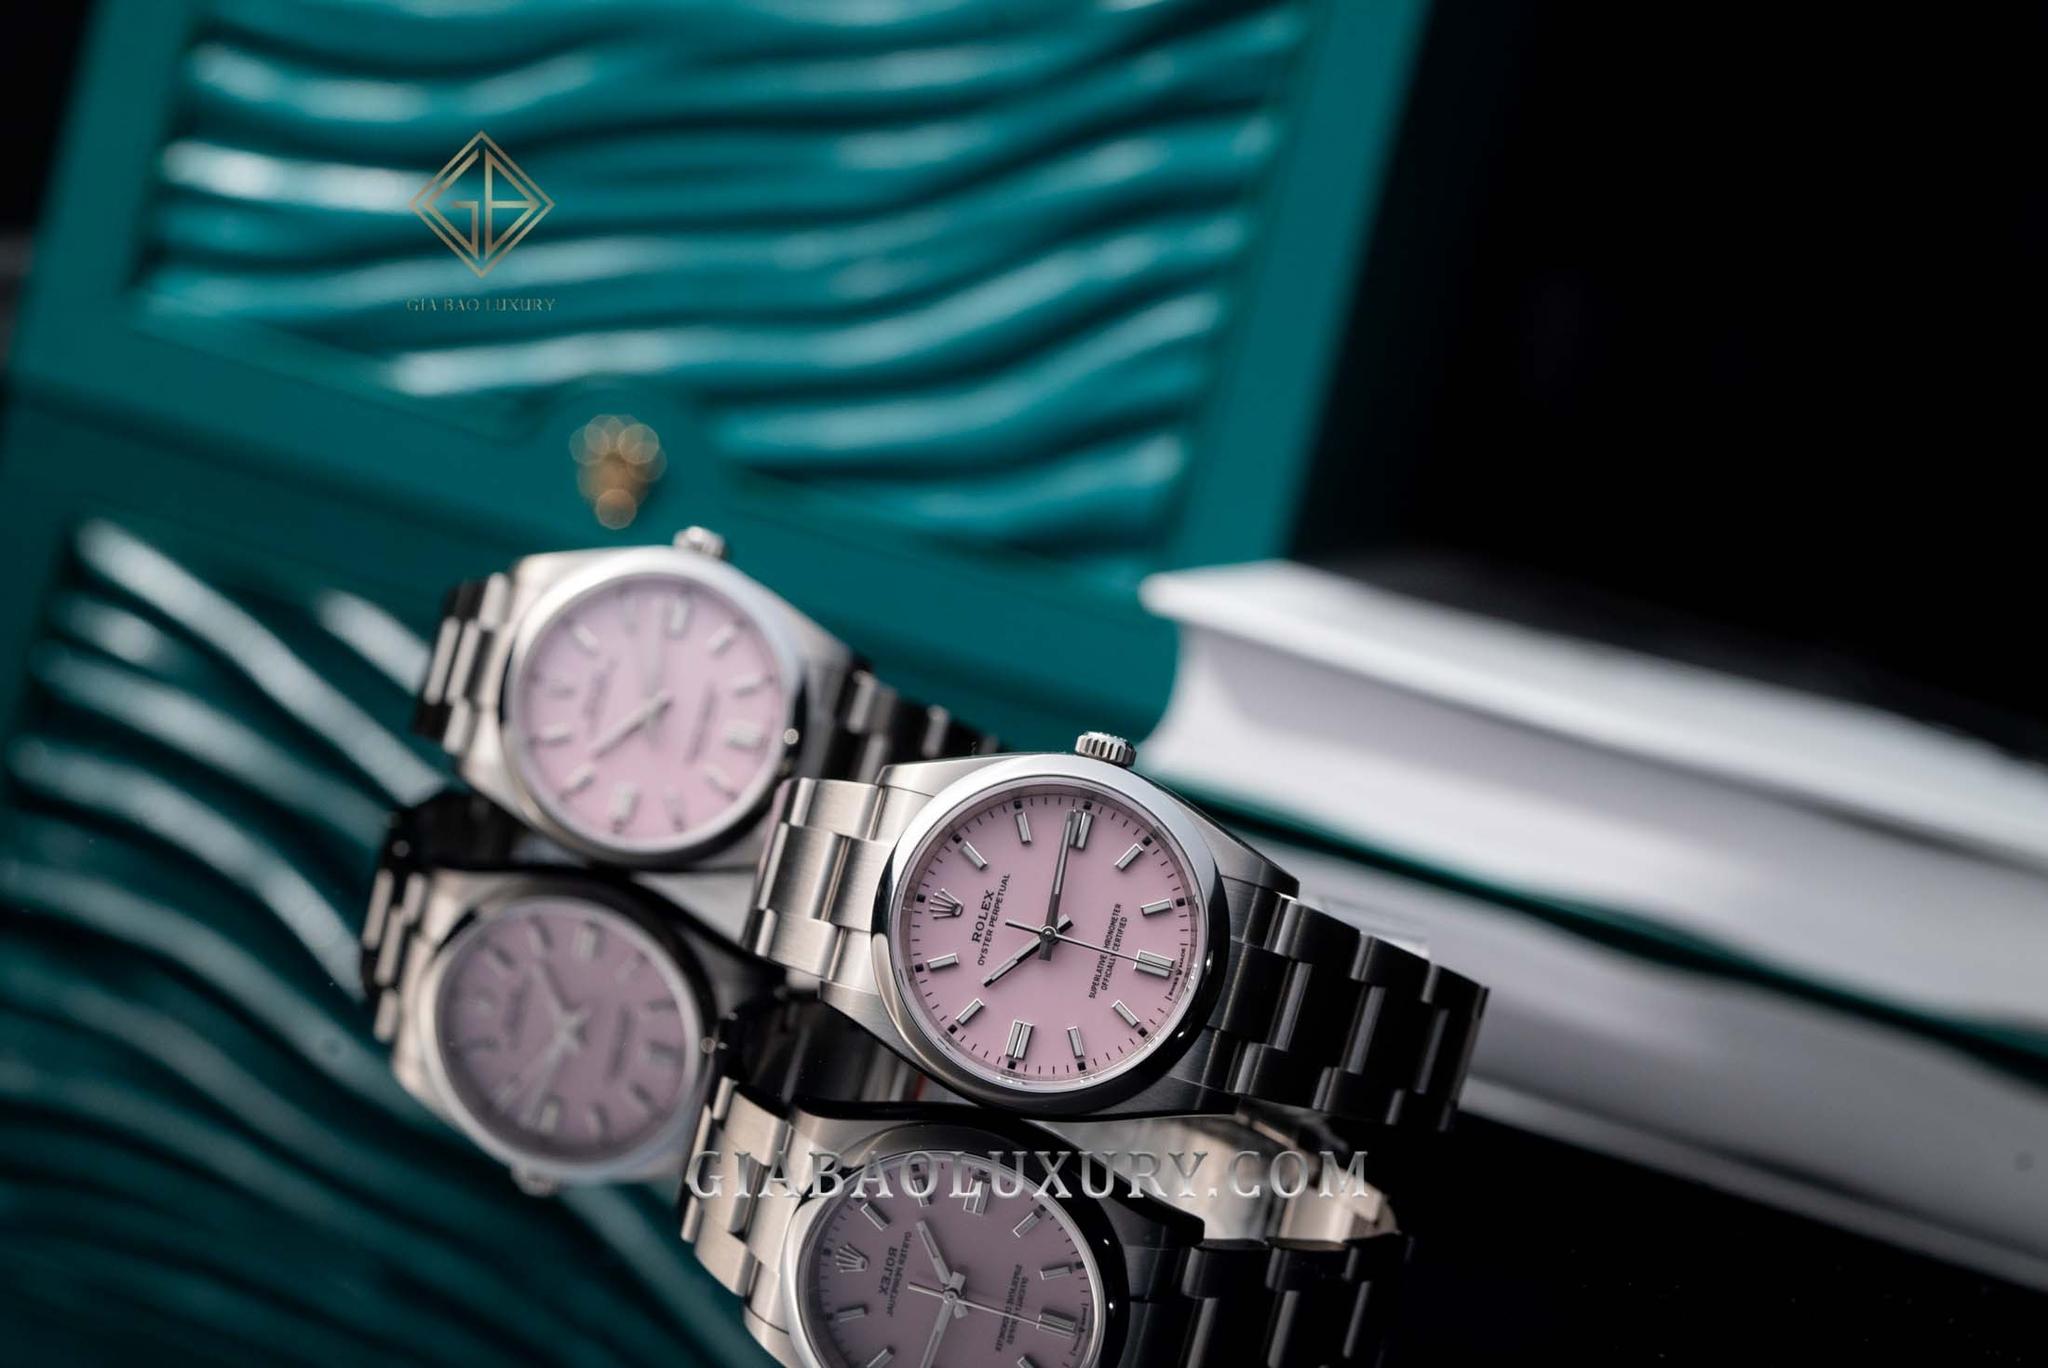 đồng hồ Rolex Oyster Perpetual năm 2020